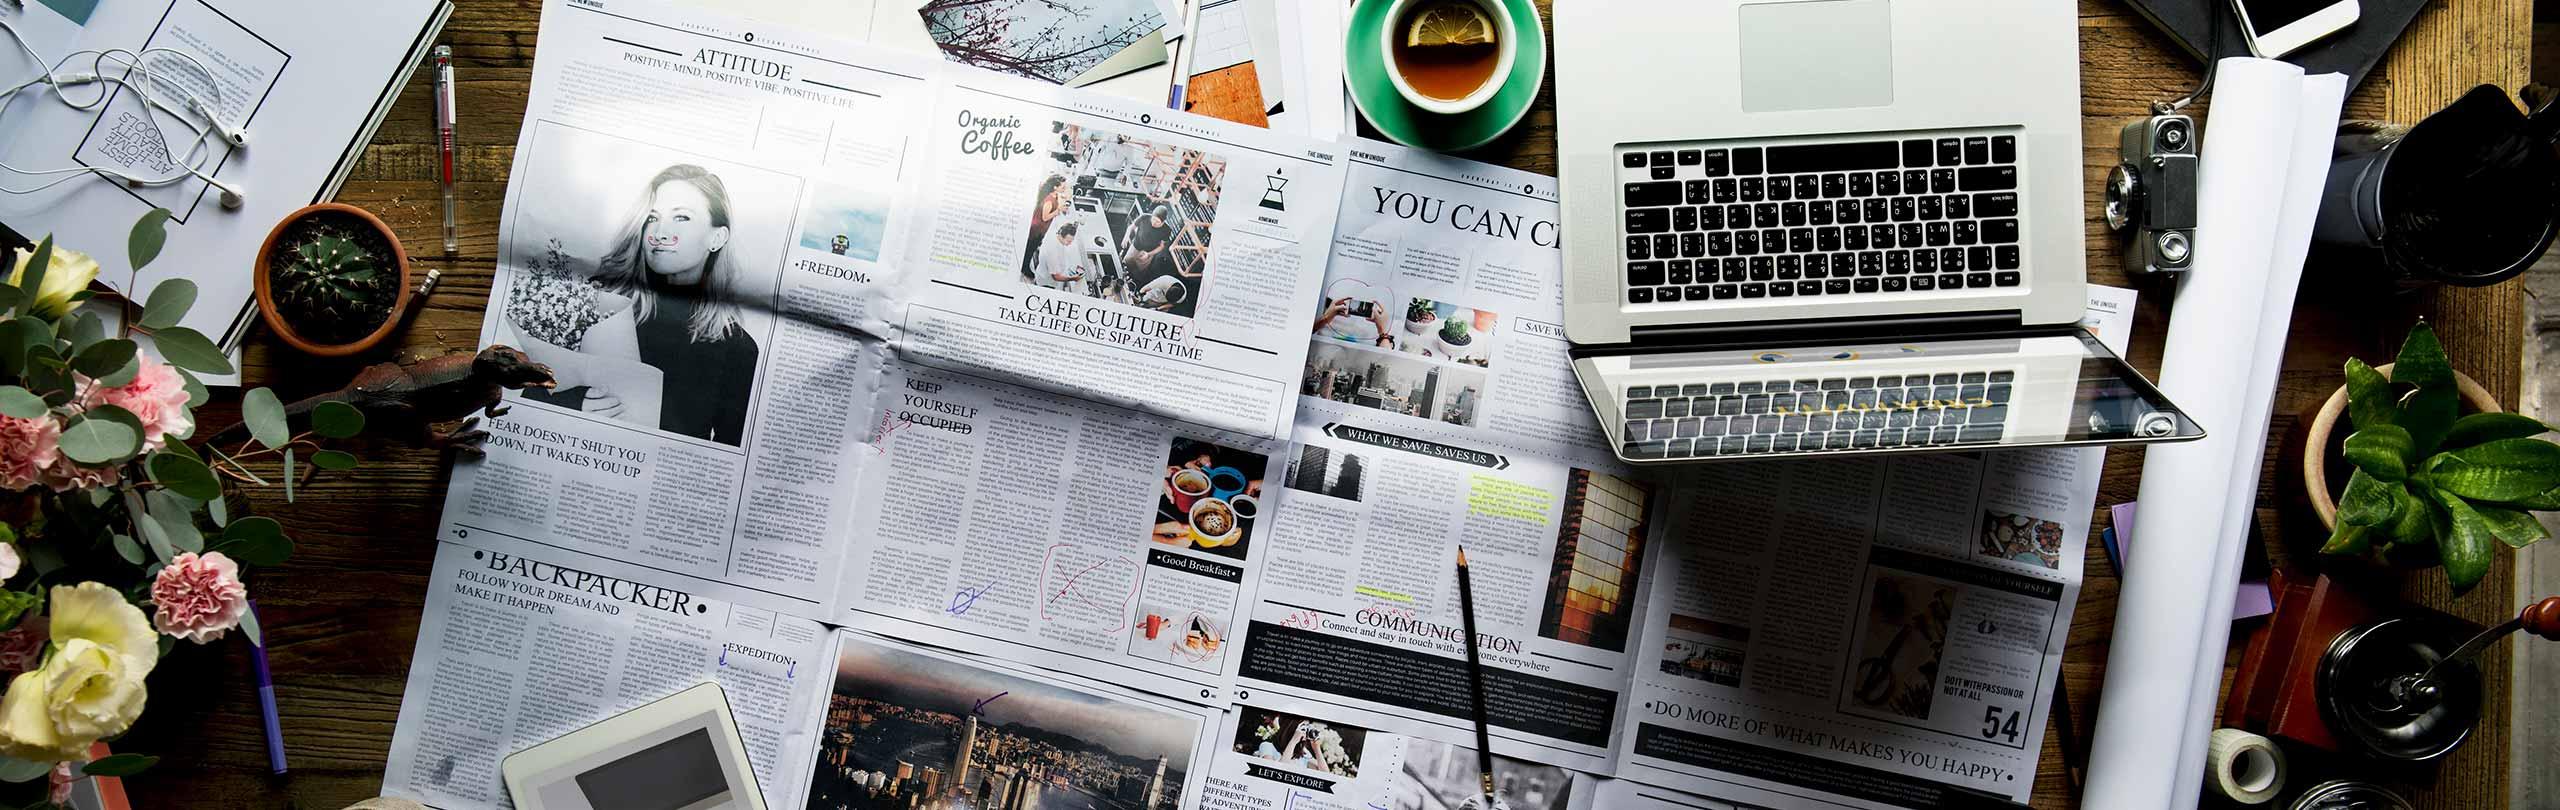 publications-background